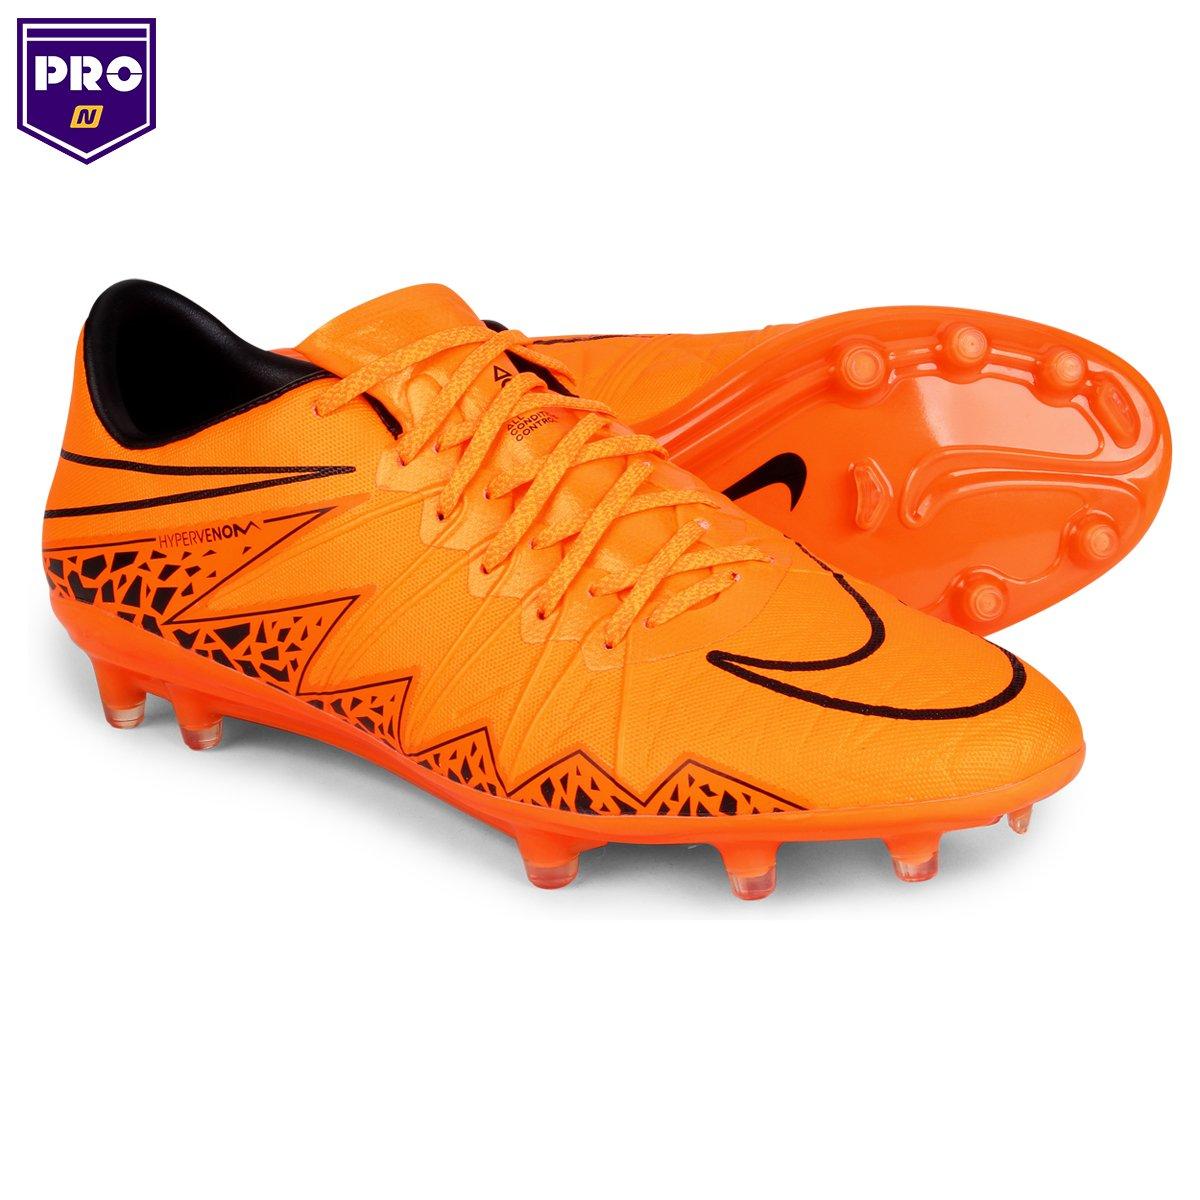 Chuteira Nike Hypervenom Phinish FG Campo - Laranja e Preto ... e8a840b6f6ccd